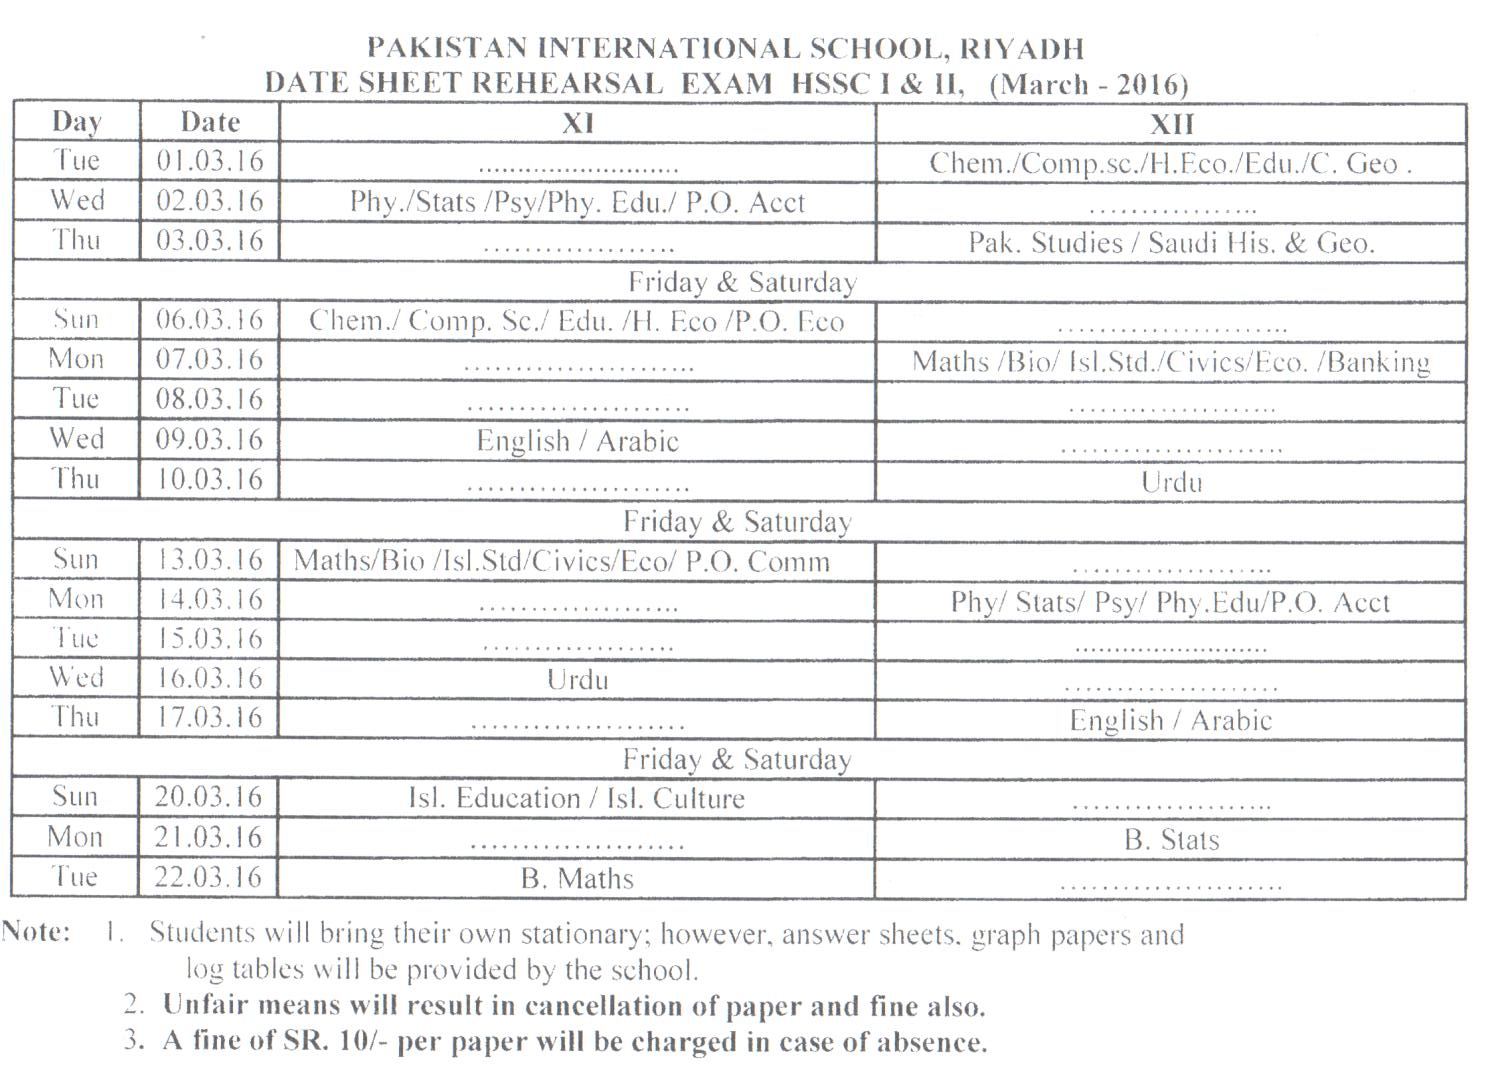 Rehearsal 2nd Semester Examination Date Sheet